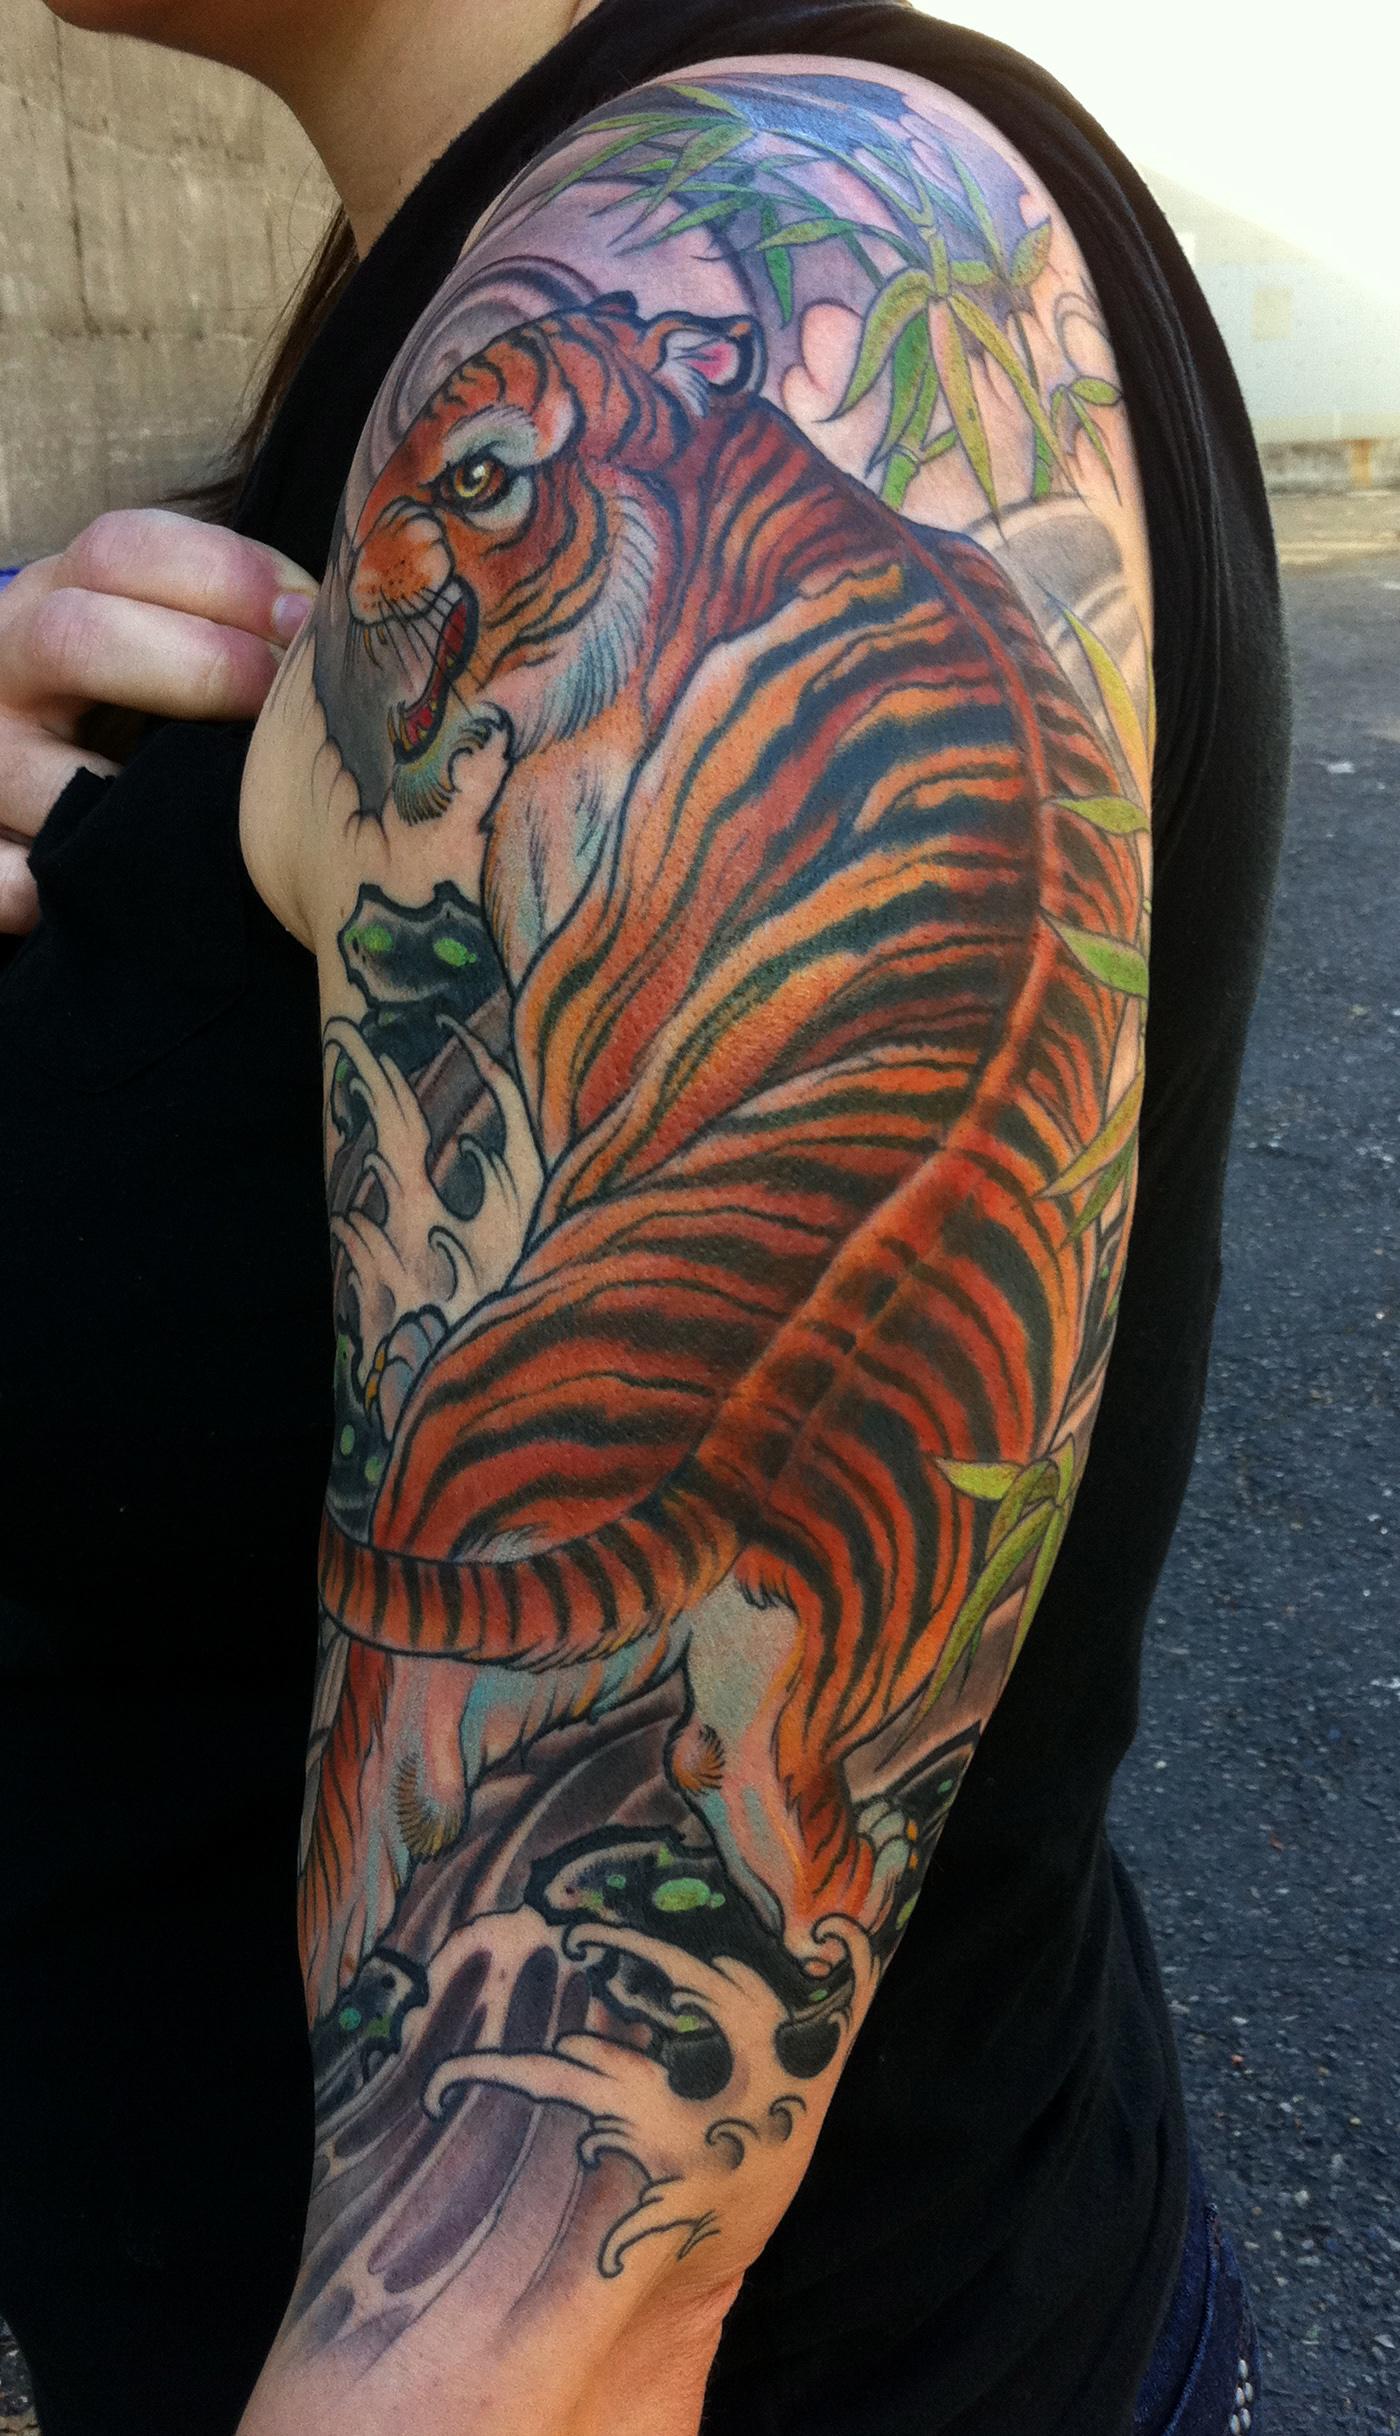 Tattoo somnambulance page 2 for Hallowed ground tattoo